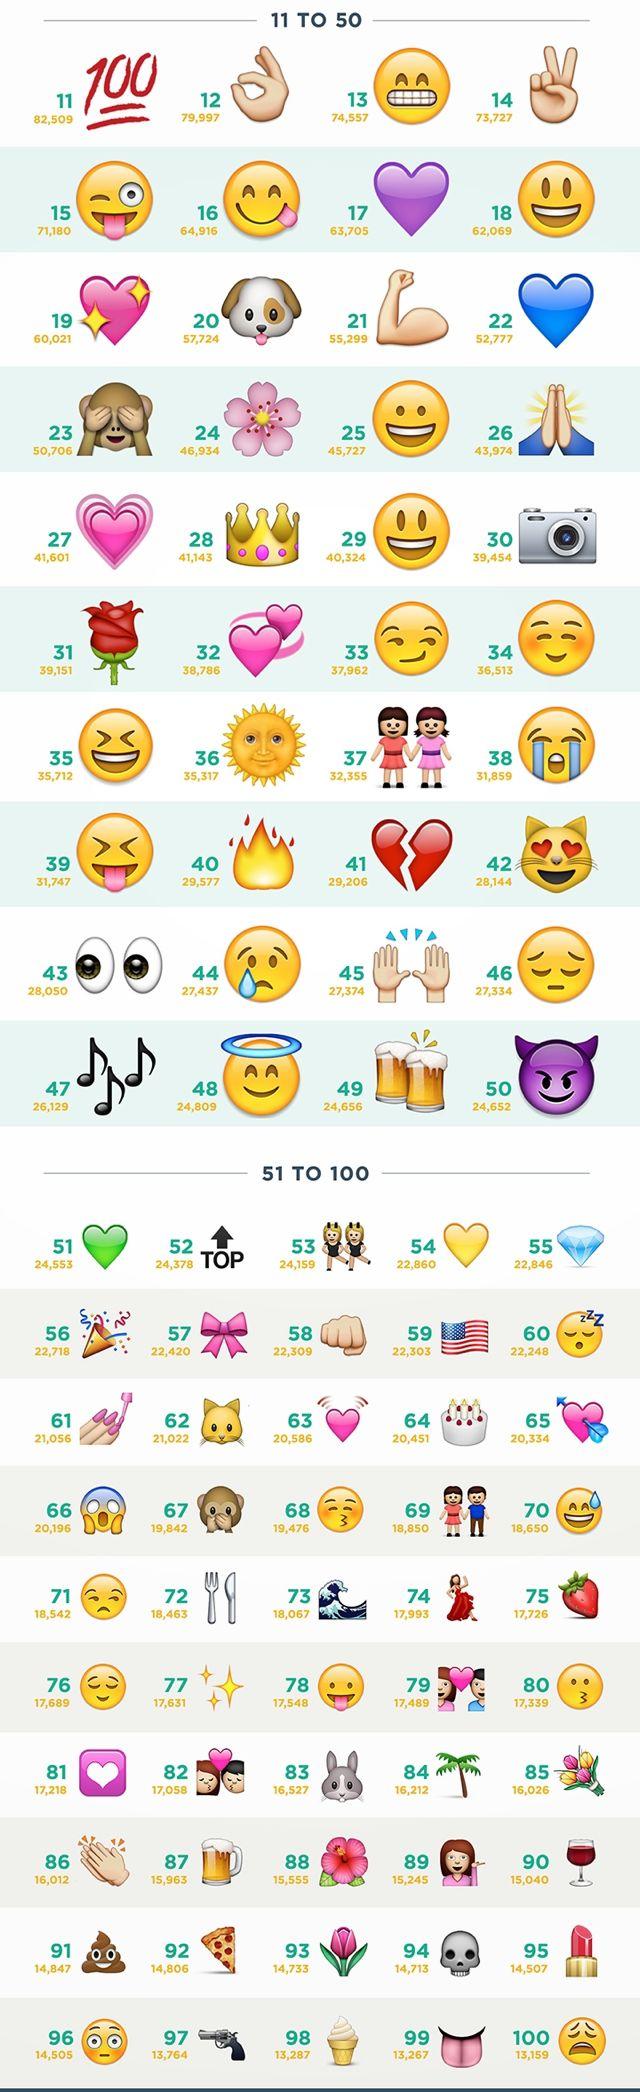 most popular emojis list